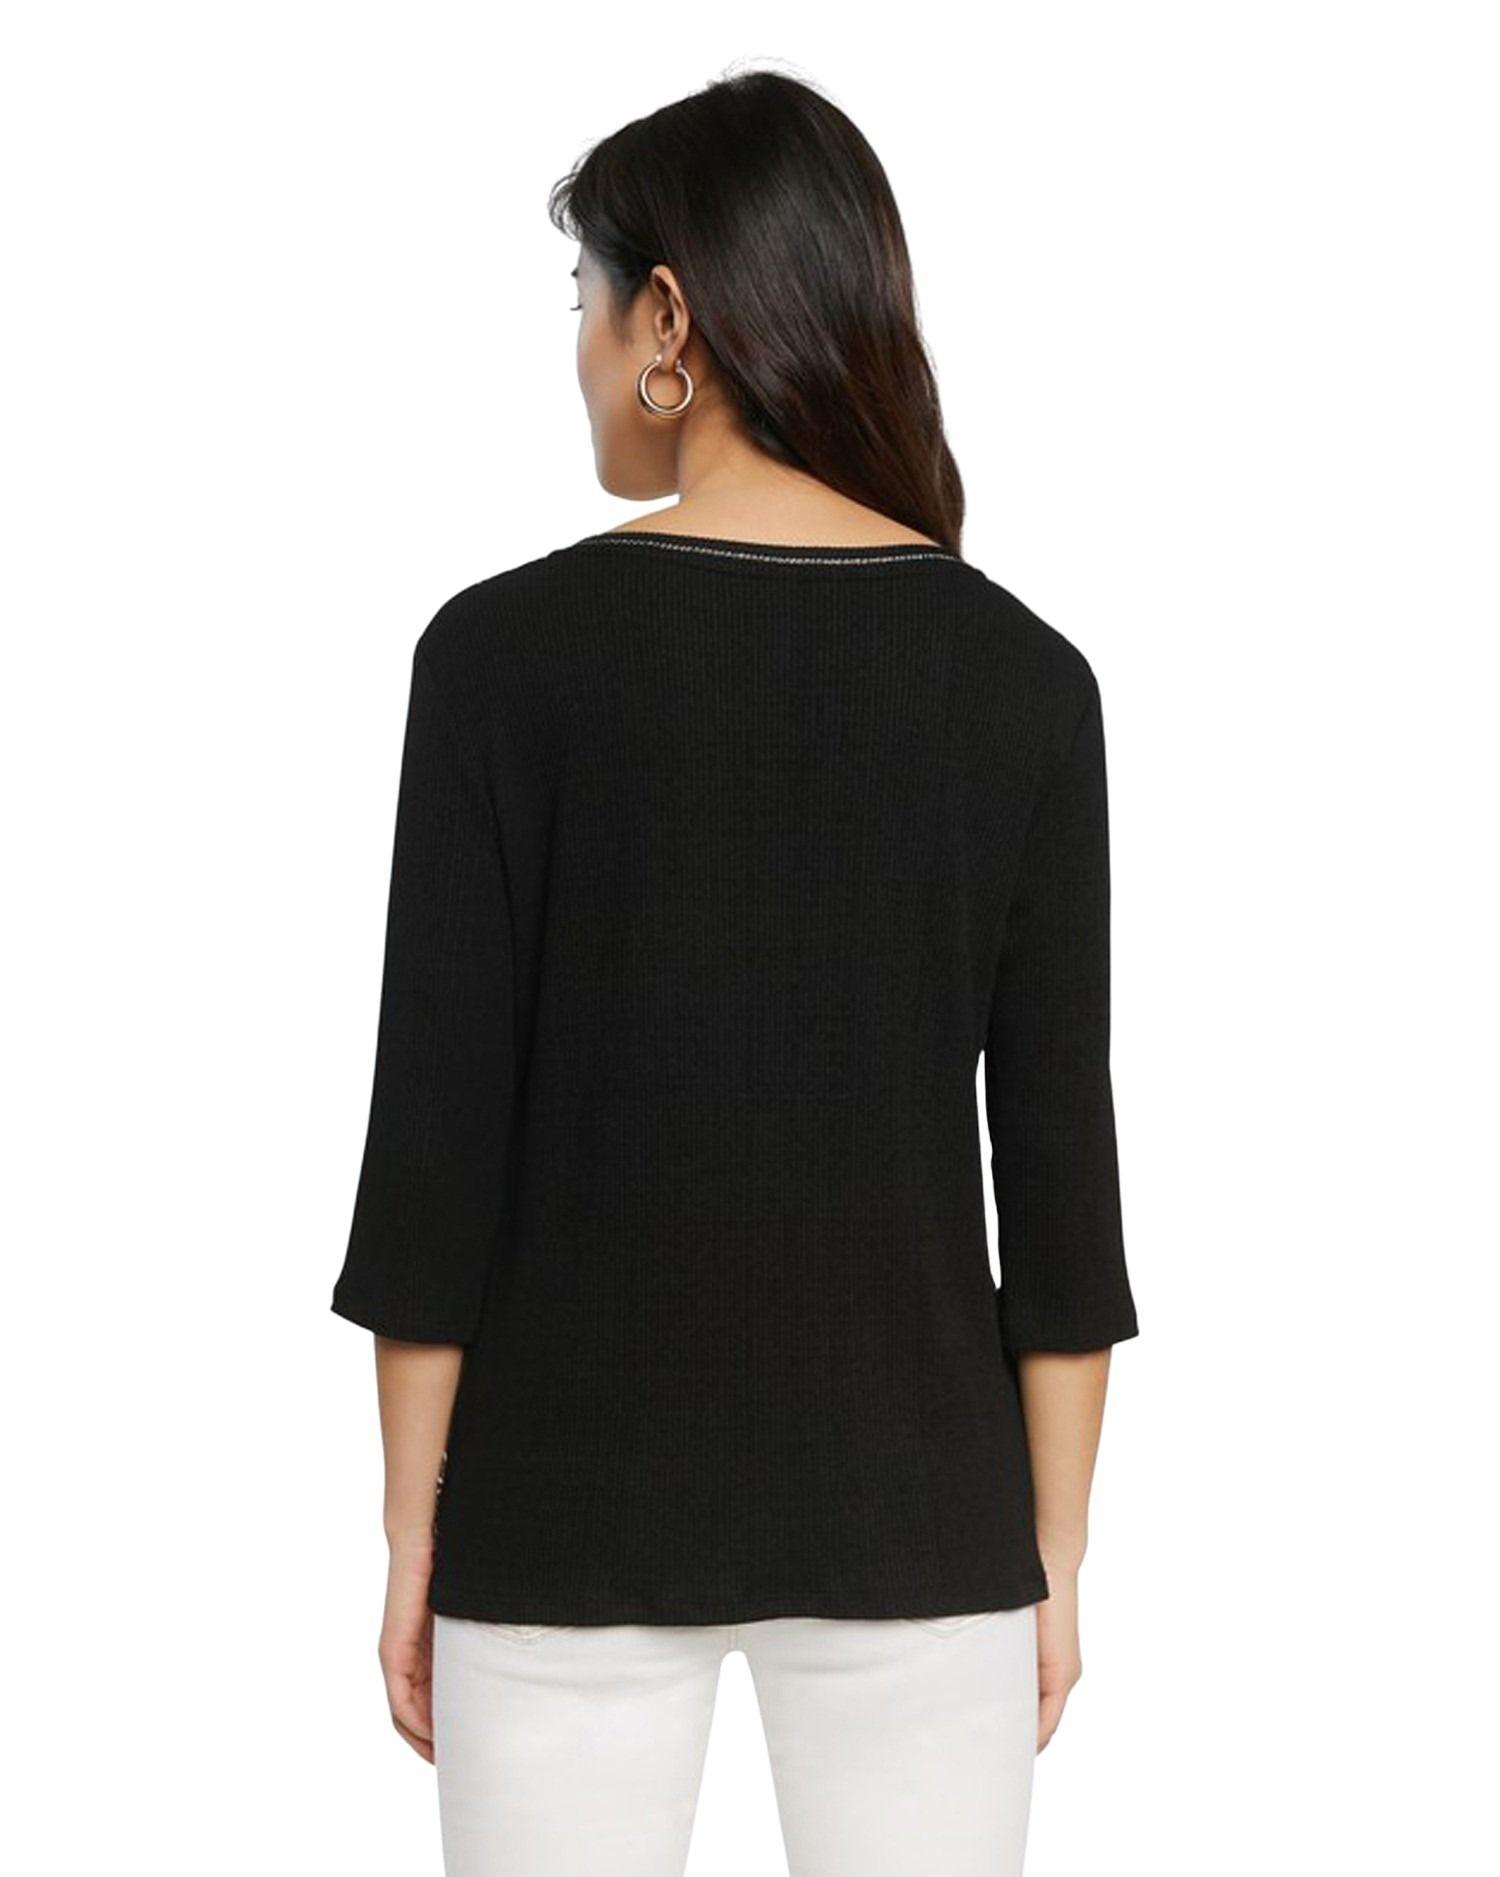 DESIGUAL T-shirts DESIGUAL WOMEN'S BLACK VISCOSE T-SHIRT